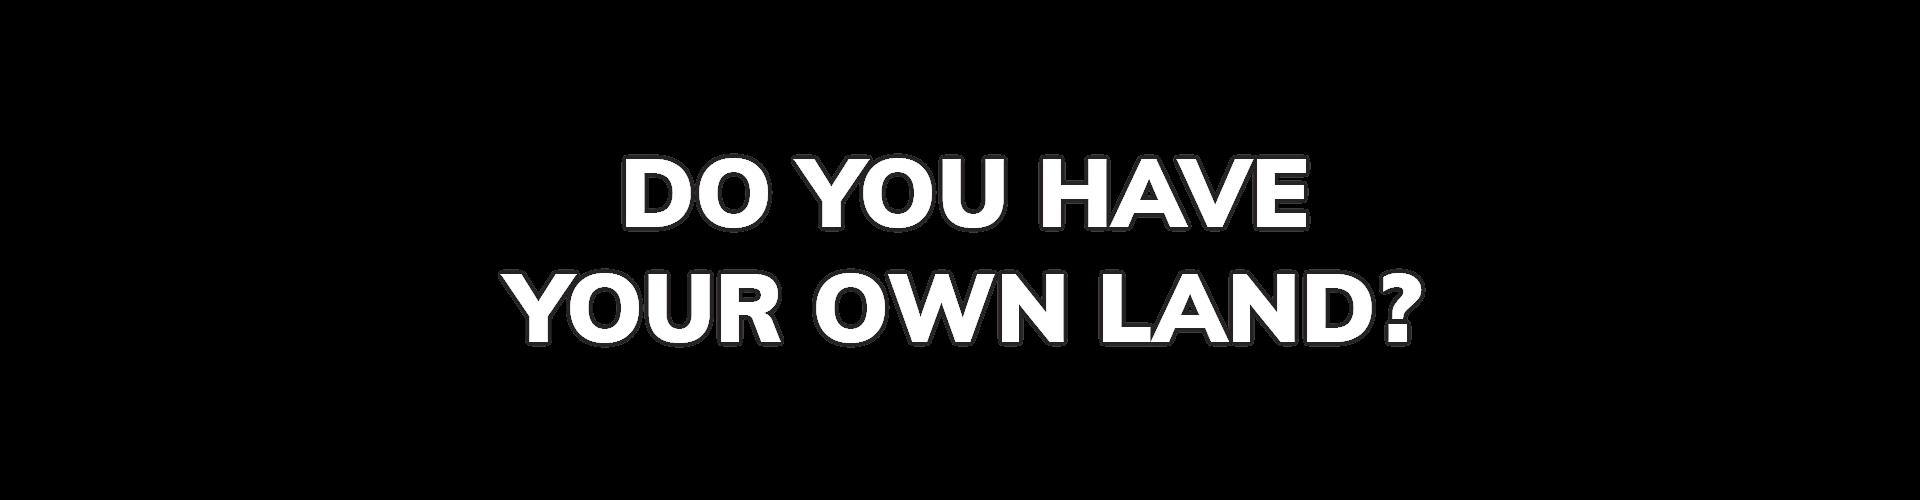 Own land